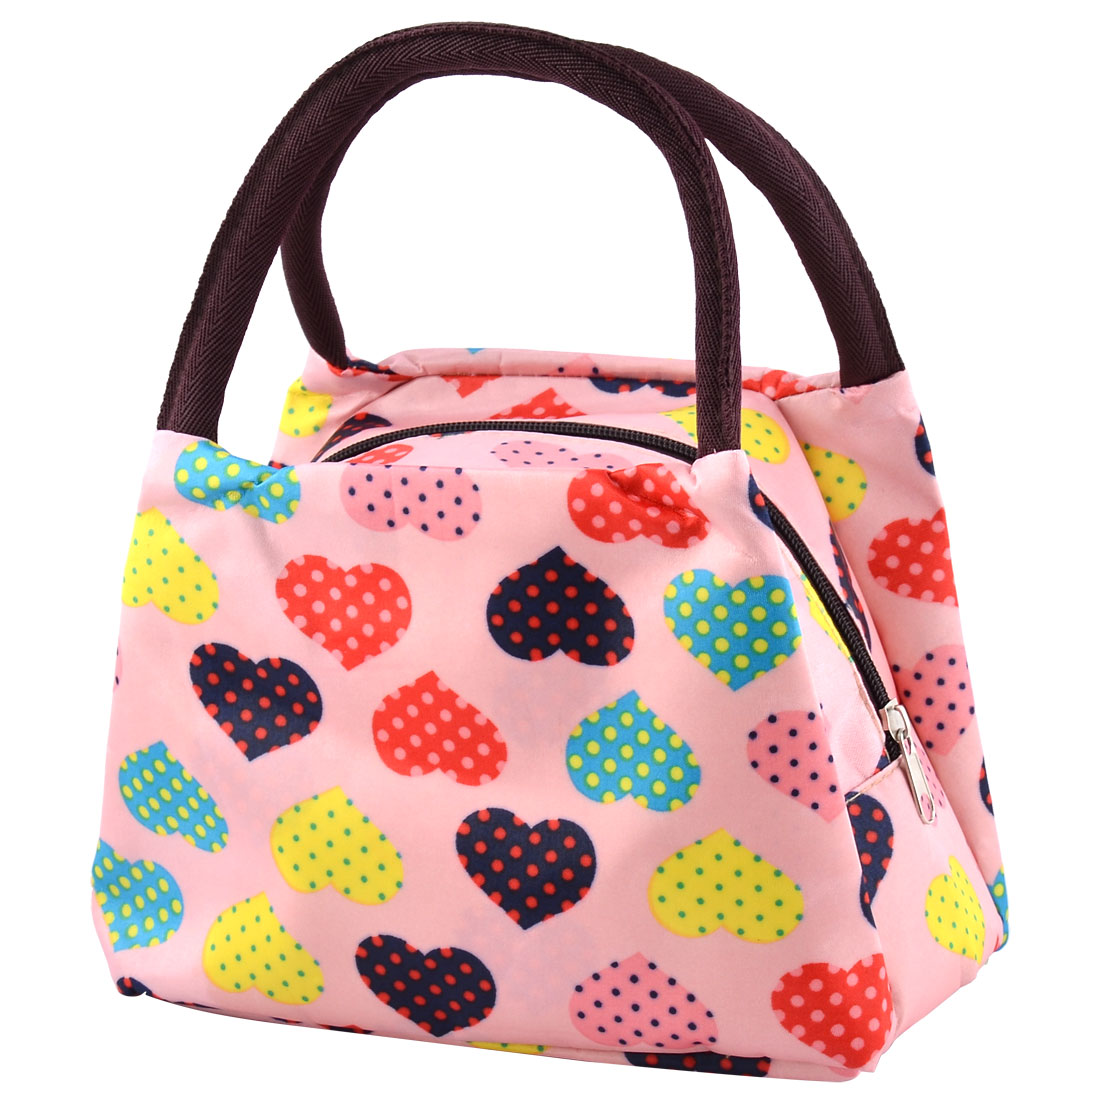 Polyester Heart Pattern Zipper Closure Design Lunch Handbag Storage Bag Pink